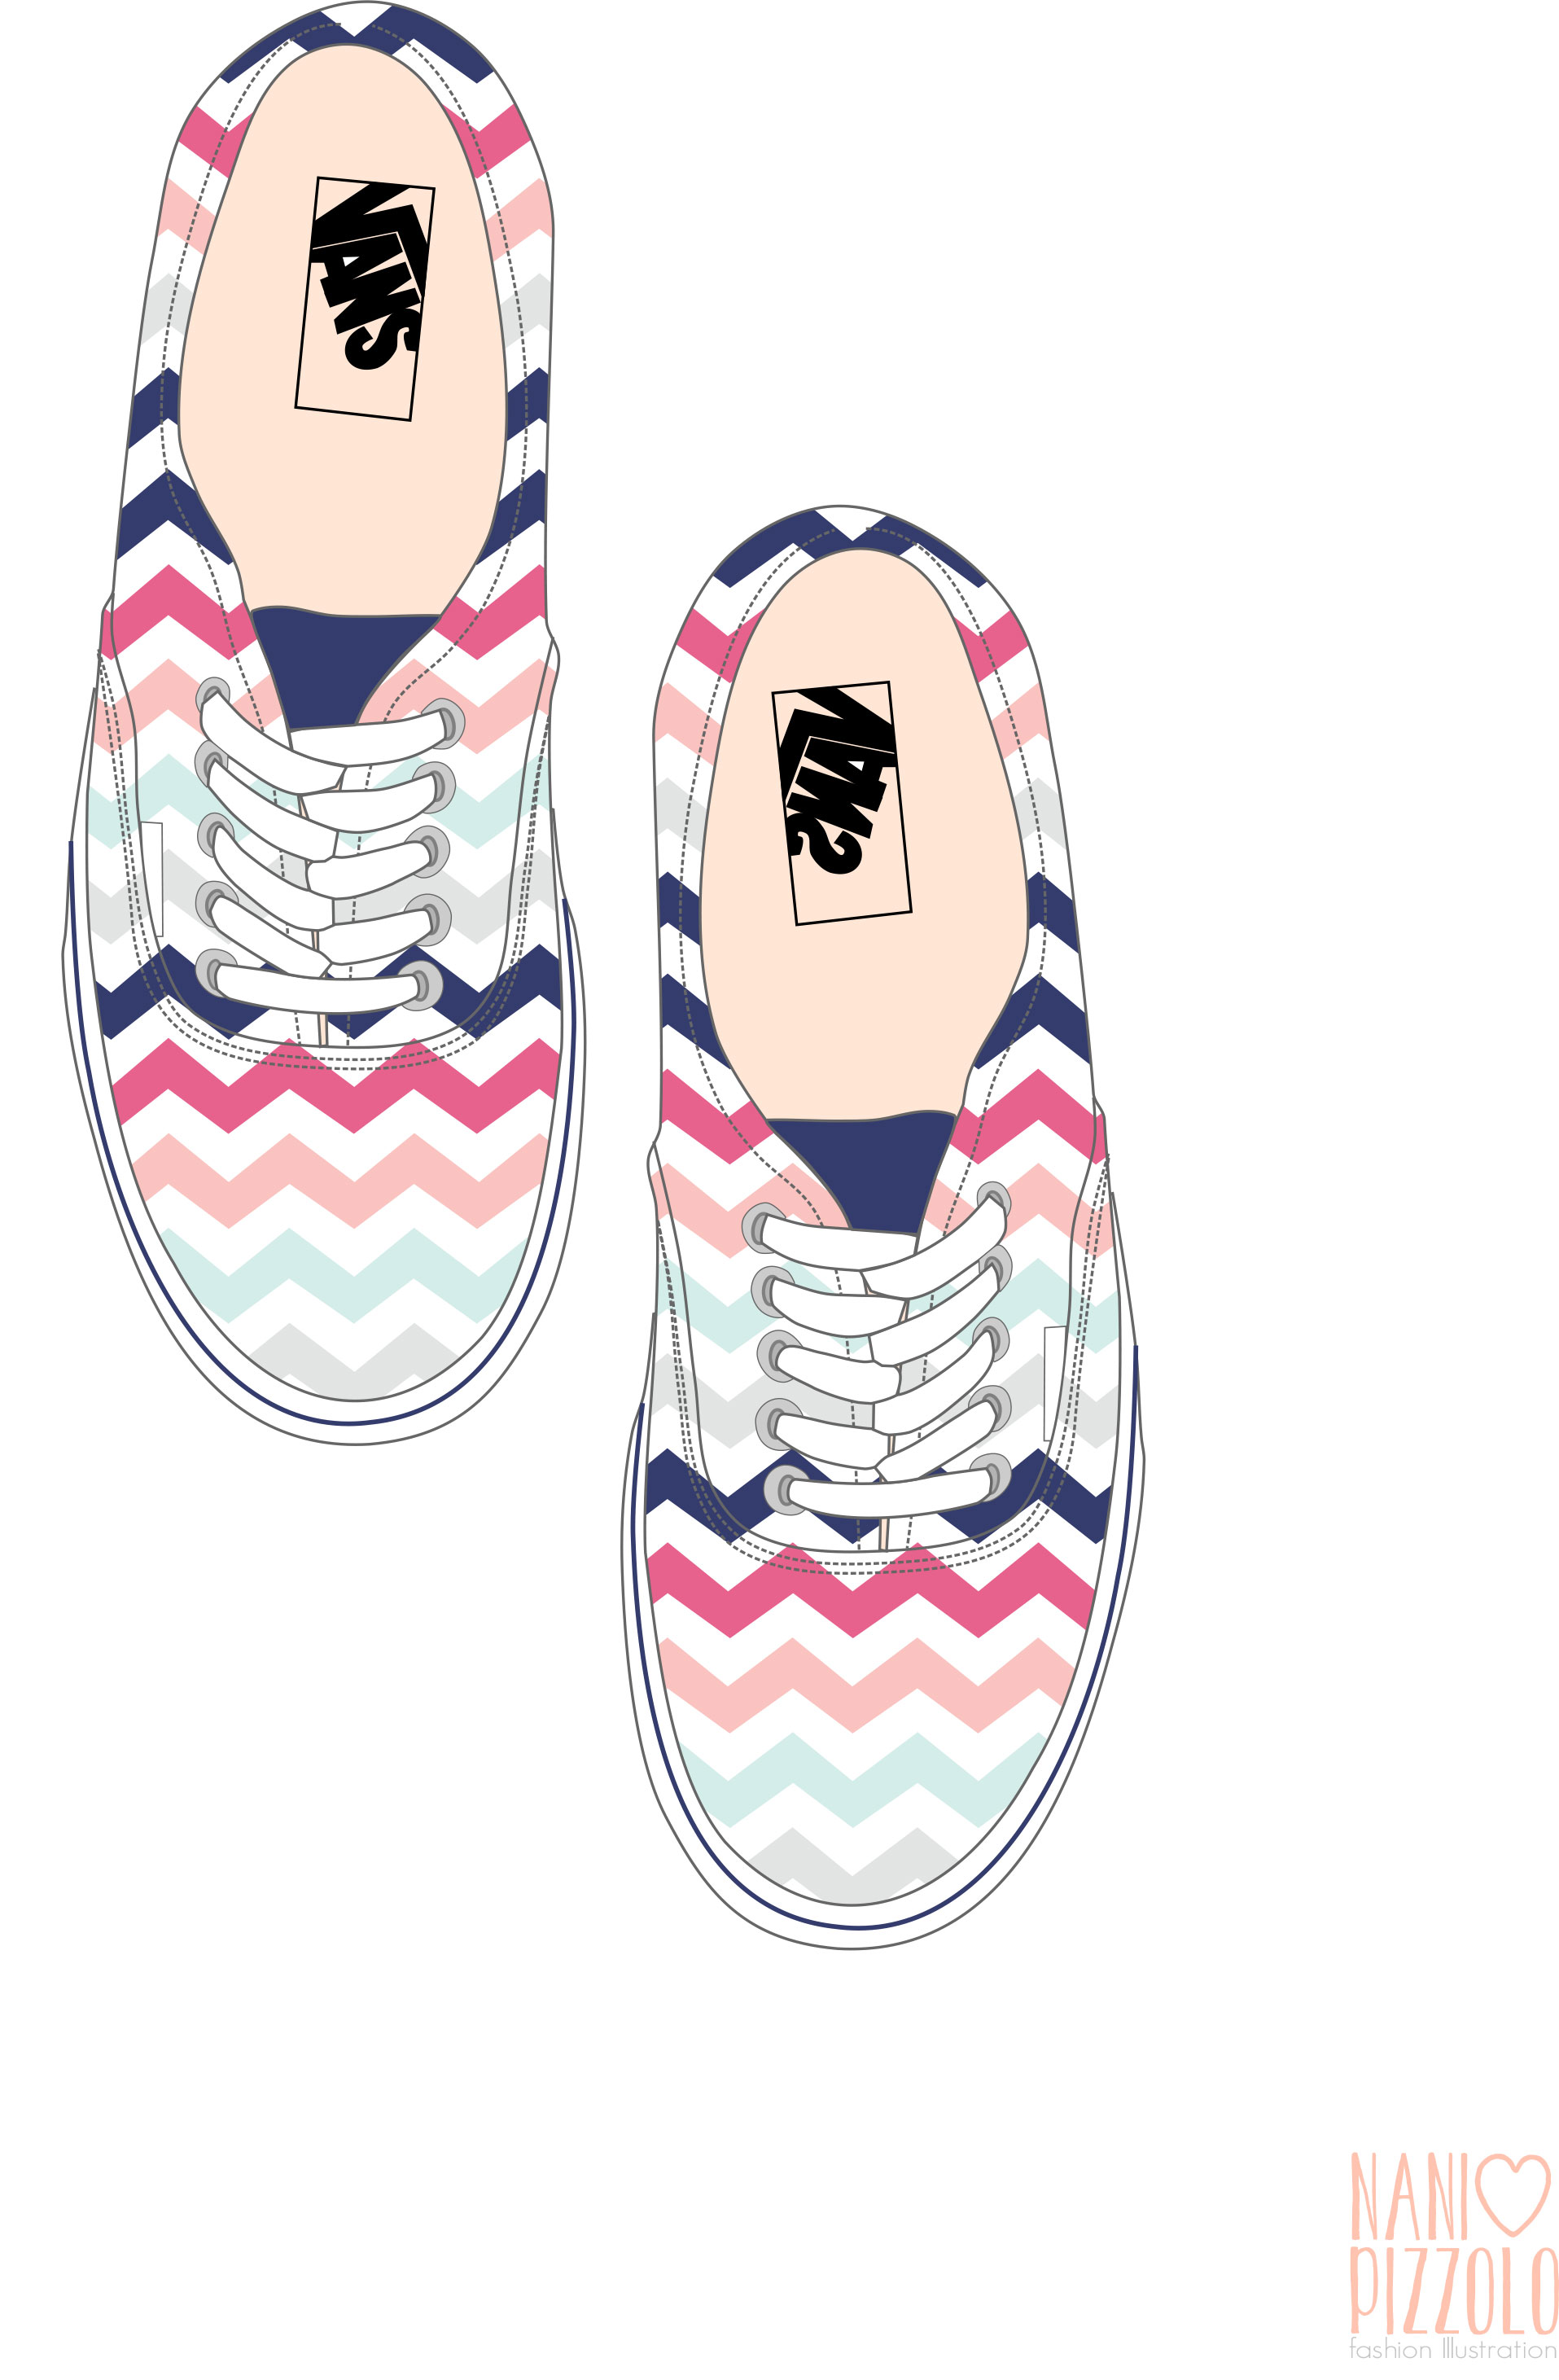 Drawn vans girly #croqui #sketch #fashionillustration fashiondesign #fashionillustration